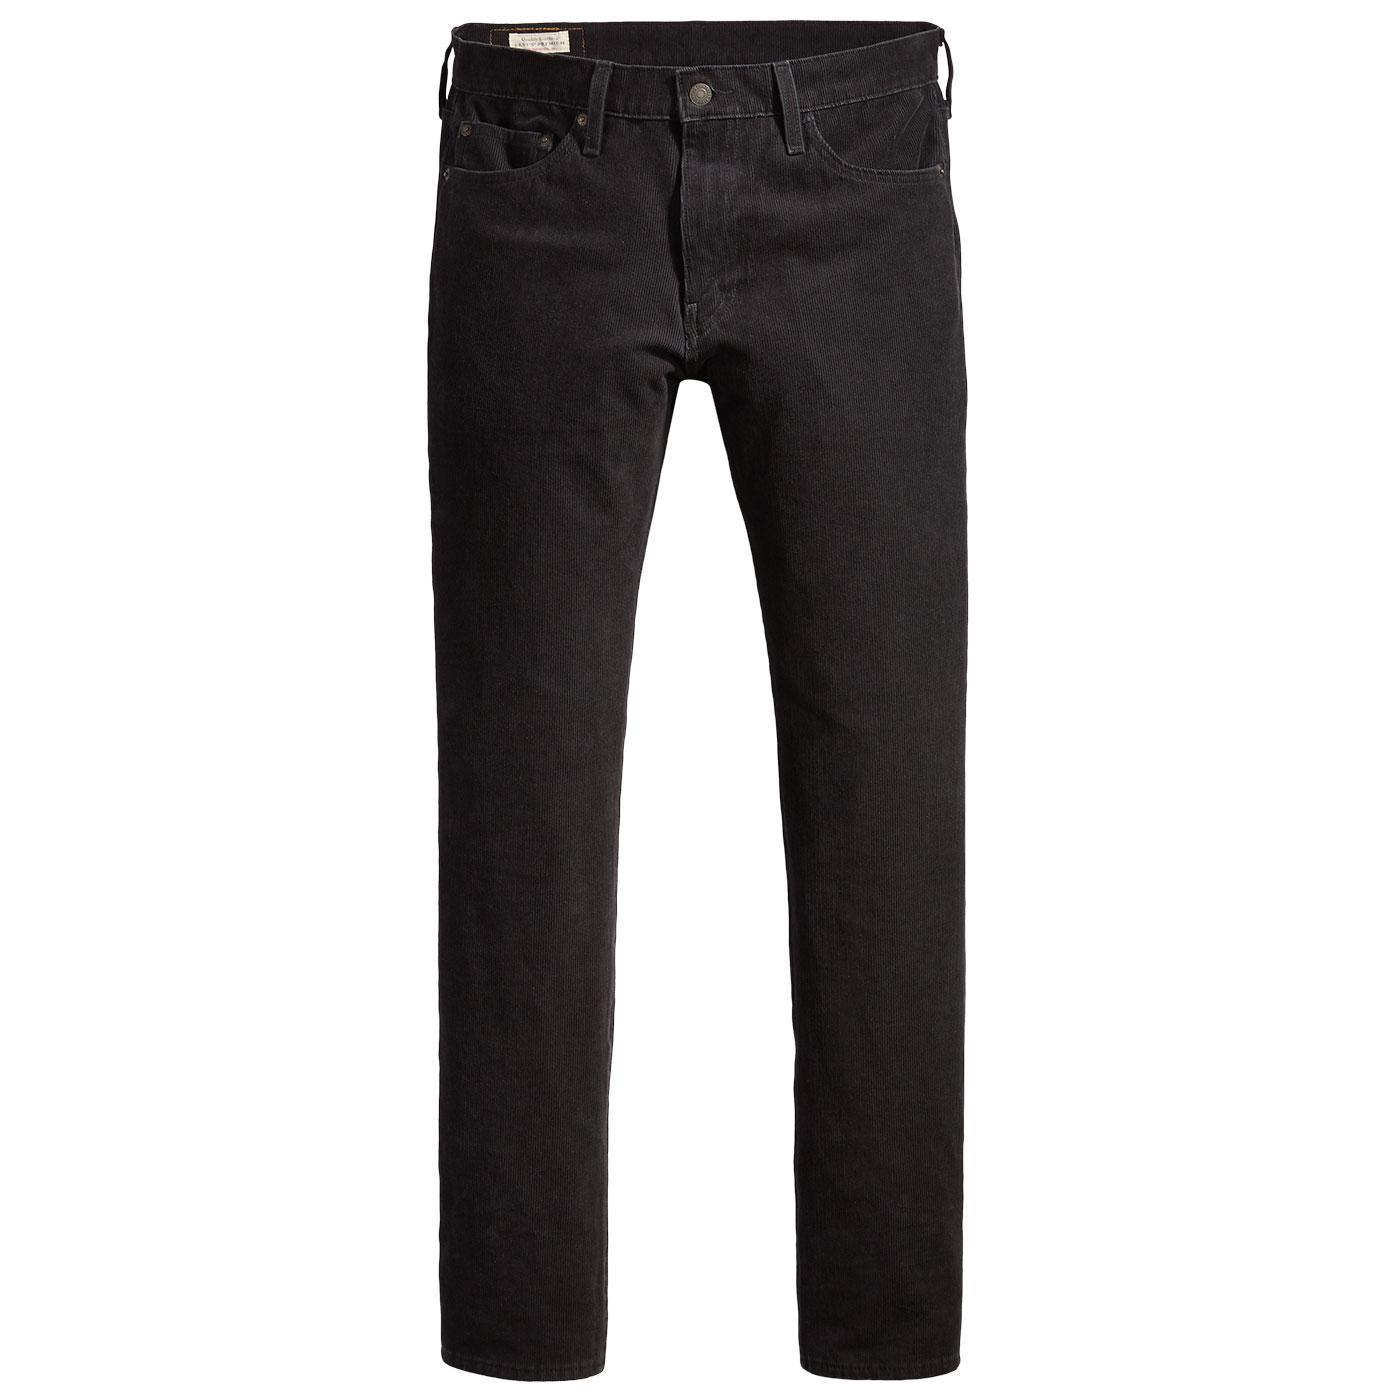 LEVI'S 511 Retro Slim Stretch Cord Jeans (Caviar)